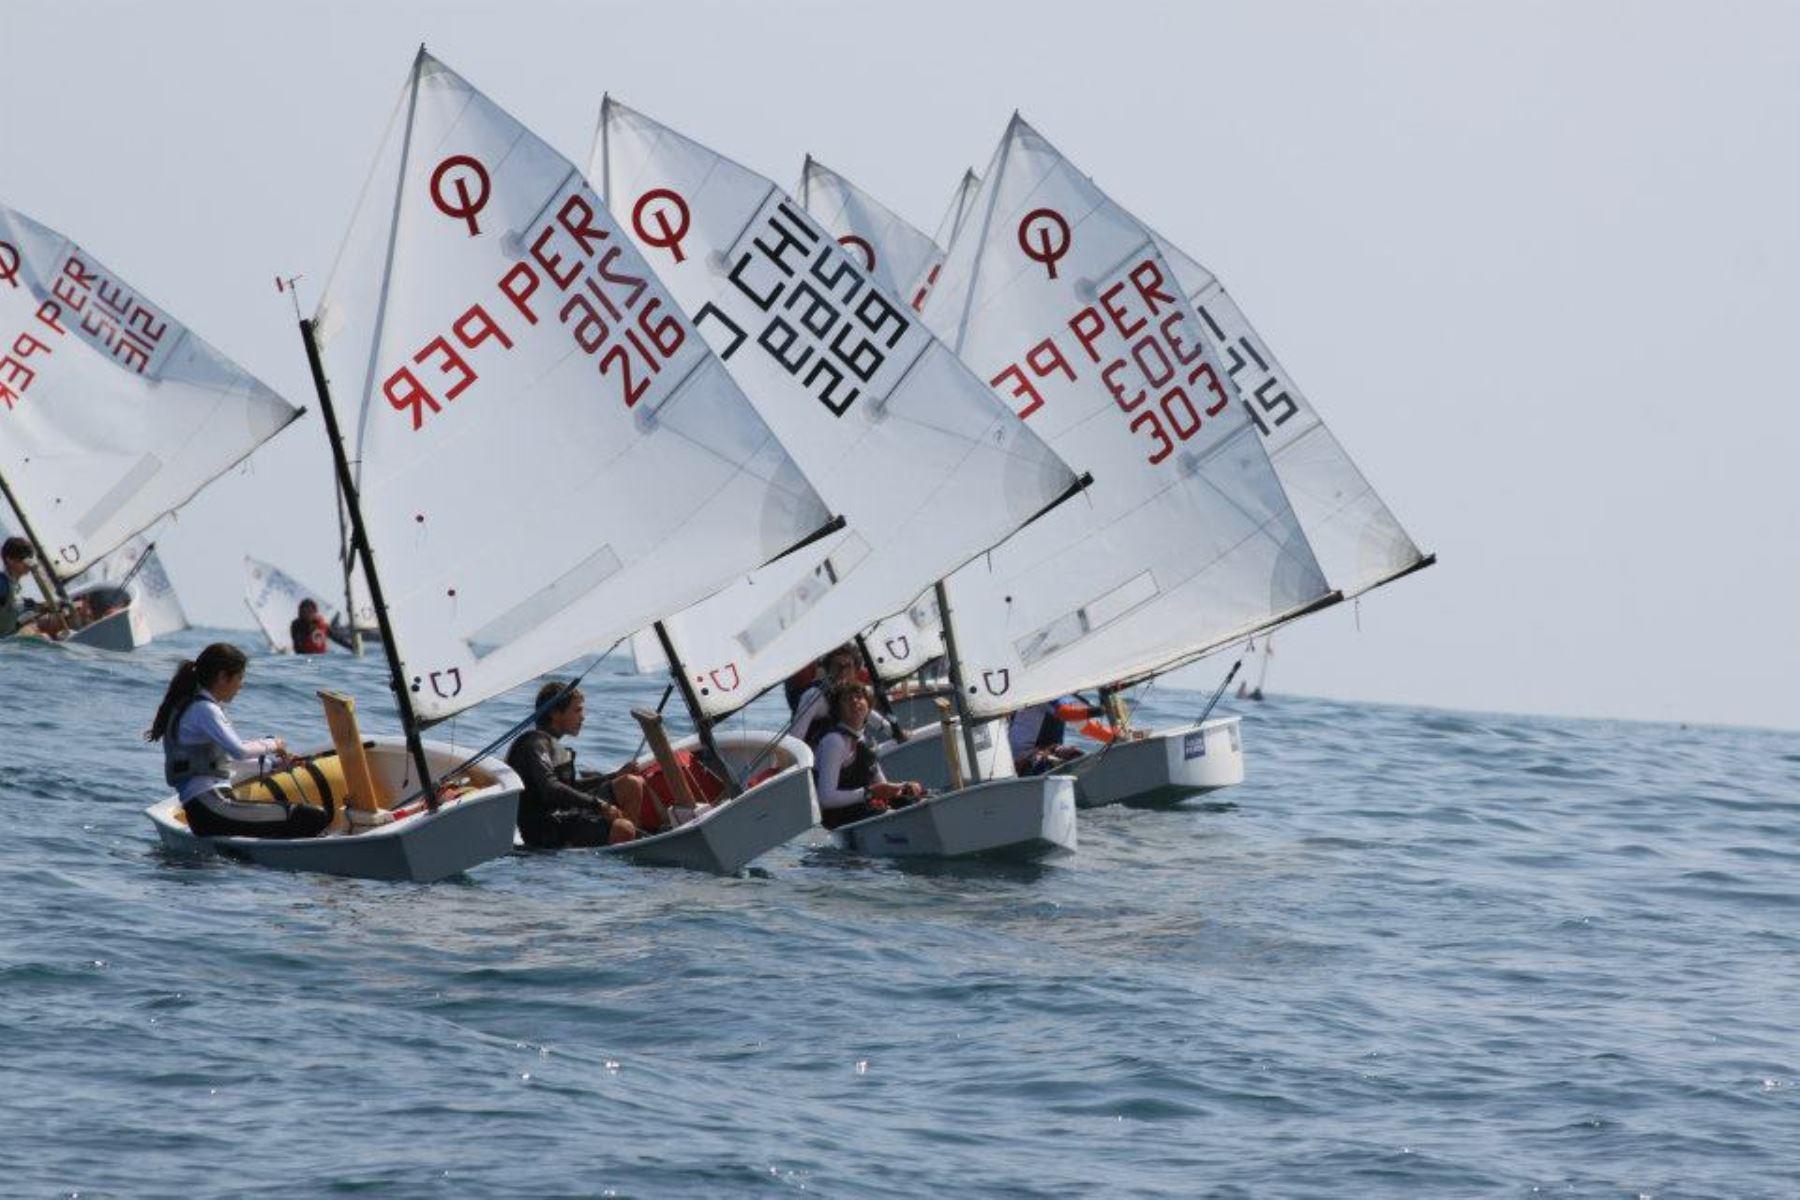 Equipo peruano de vela se prepara para mundial de Chipre